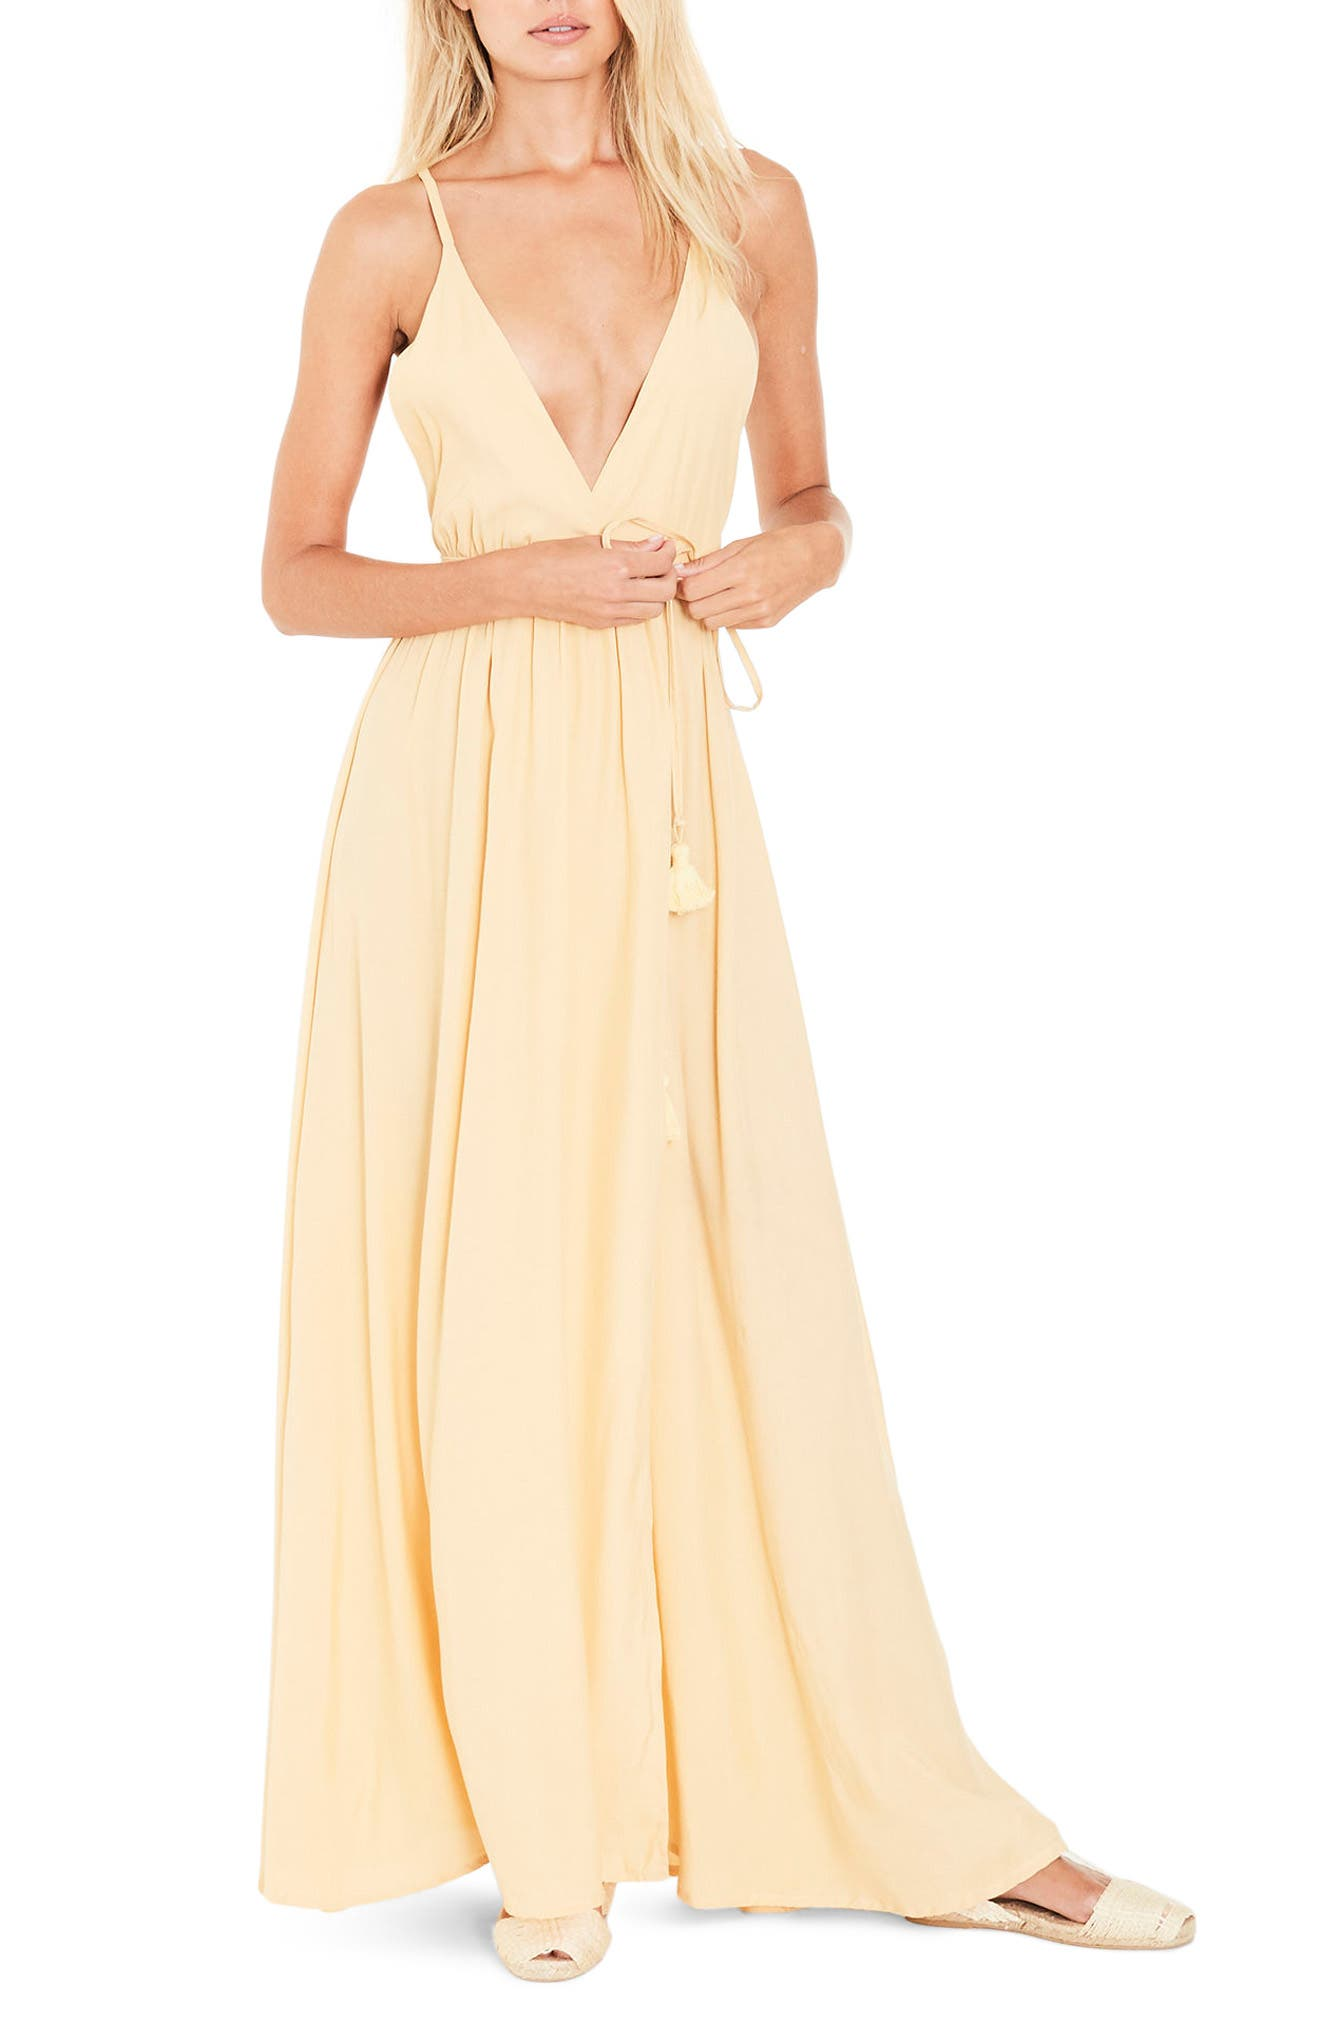 Santa Rose Strappy Maxi Dress,                         Main,                         color, 700